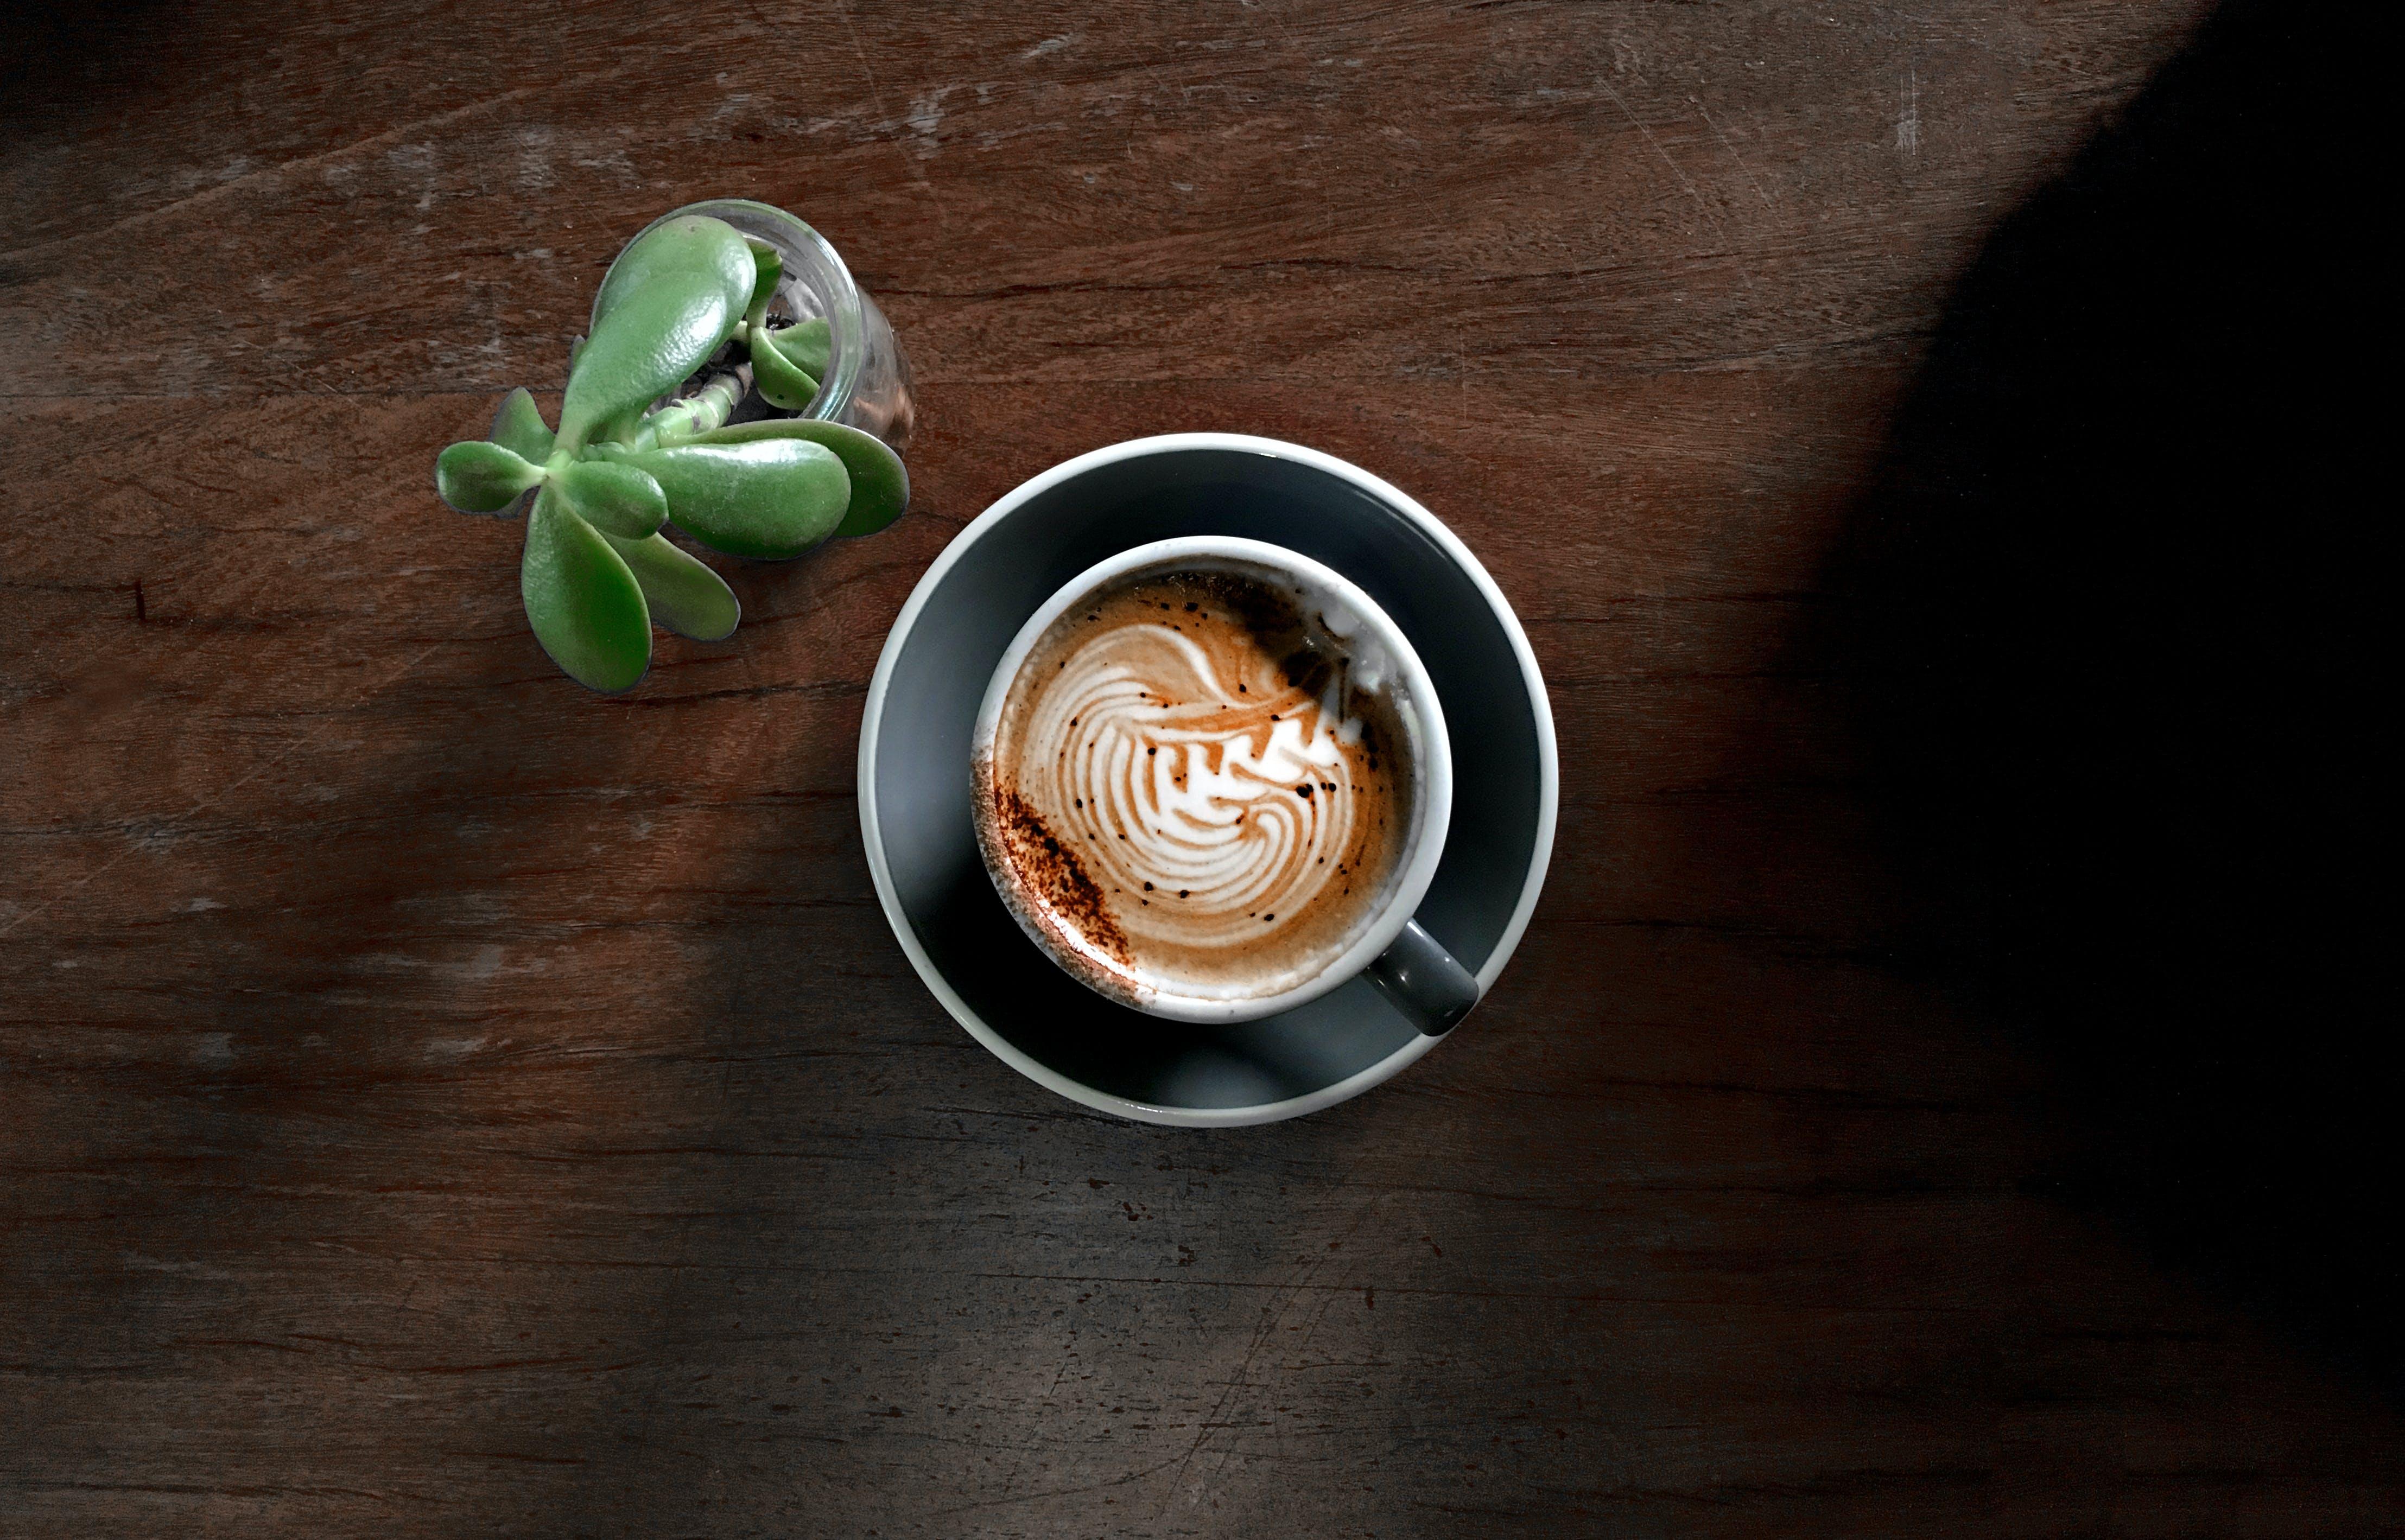 Gratis stockfoto met cafeïne, cappuccino, donker, drank